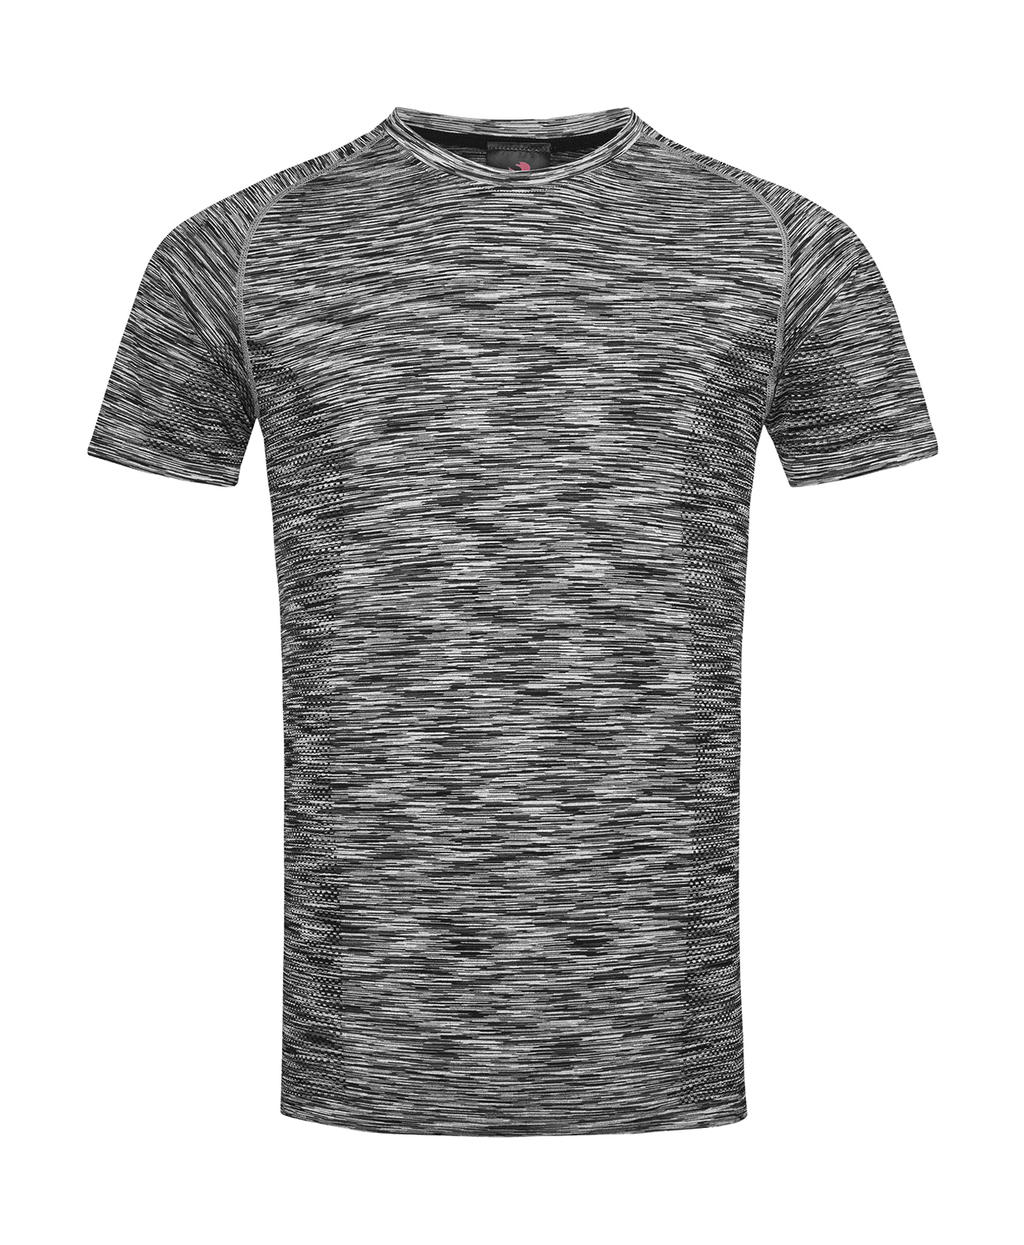 Pánské bezešvé triko - zvìtšit obrázek